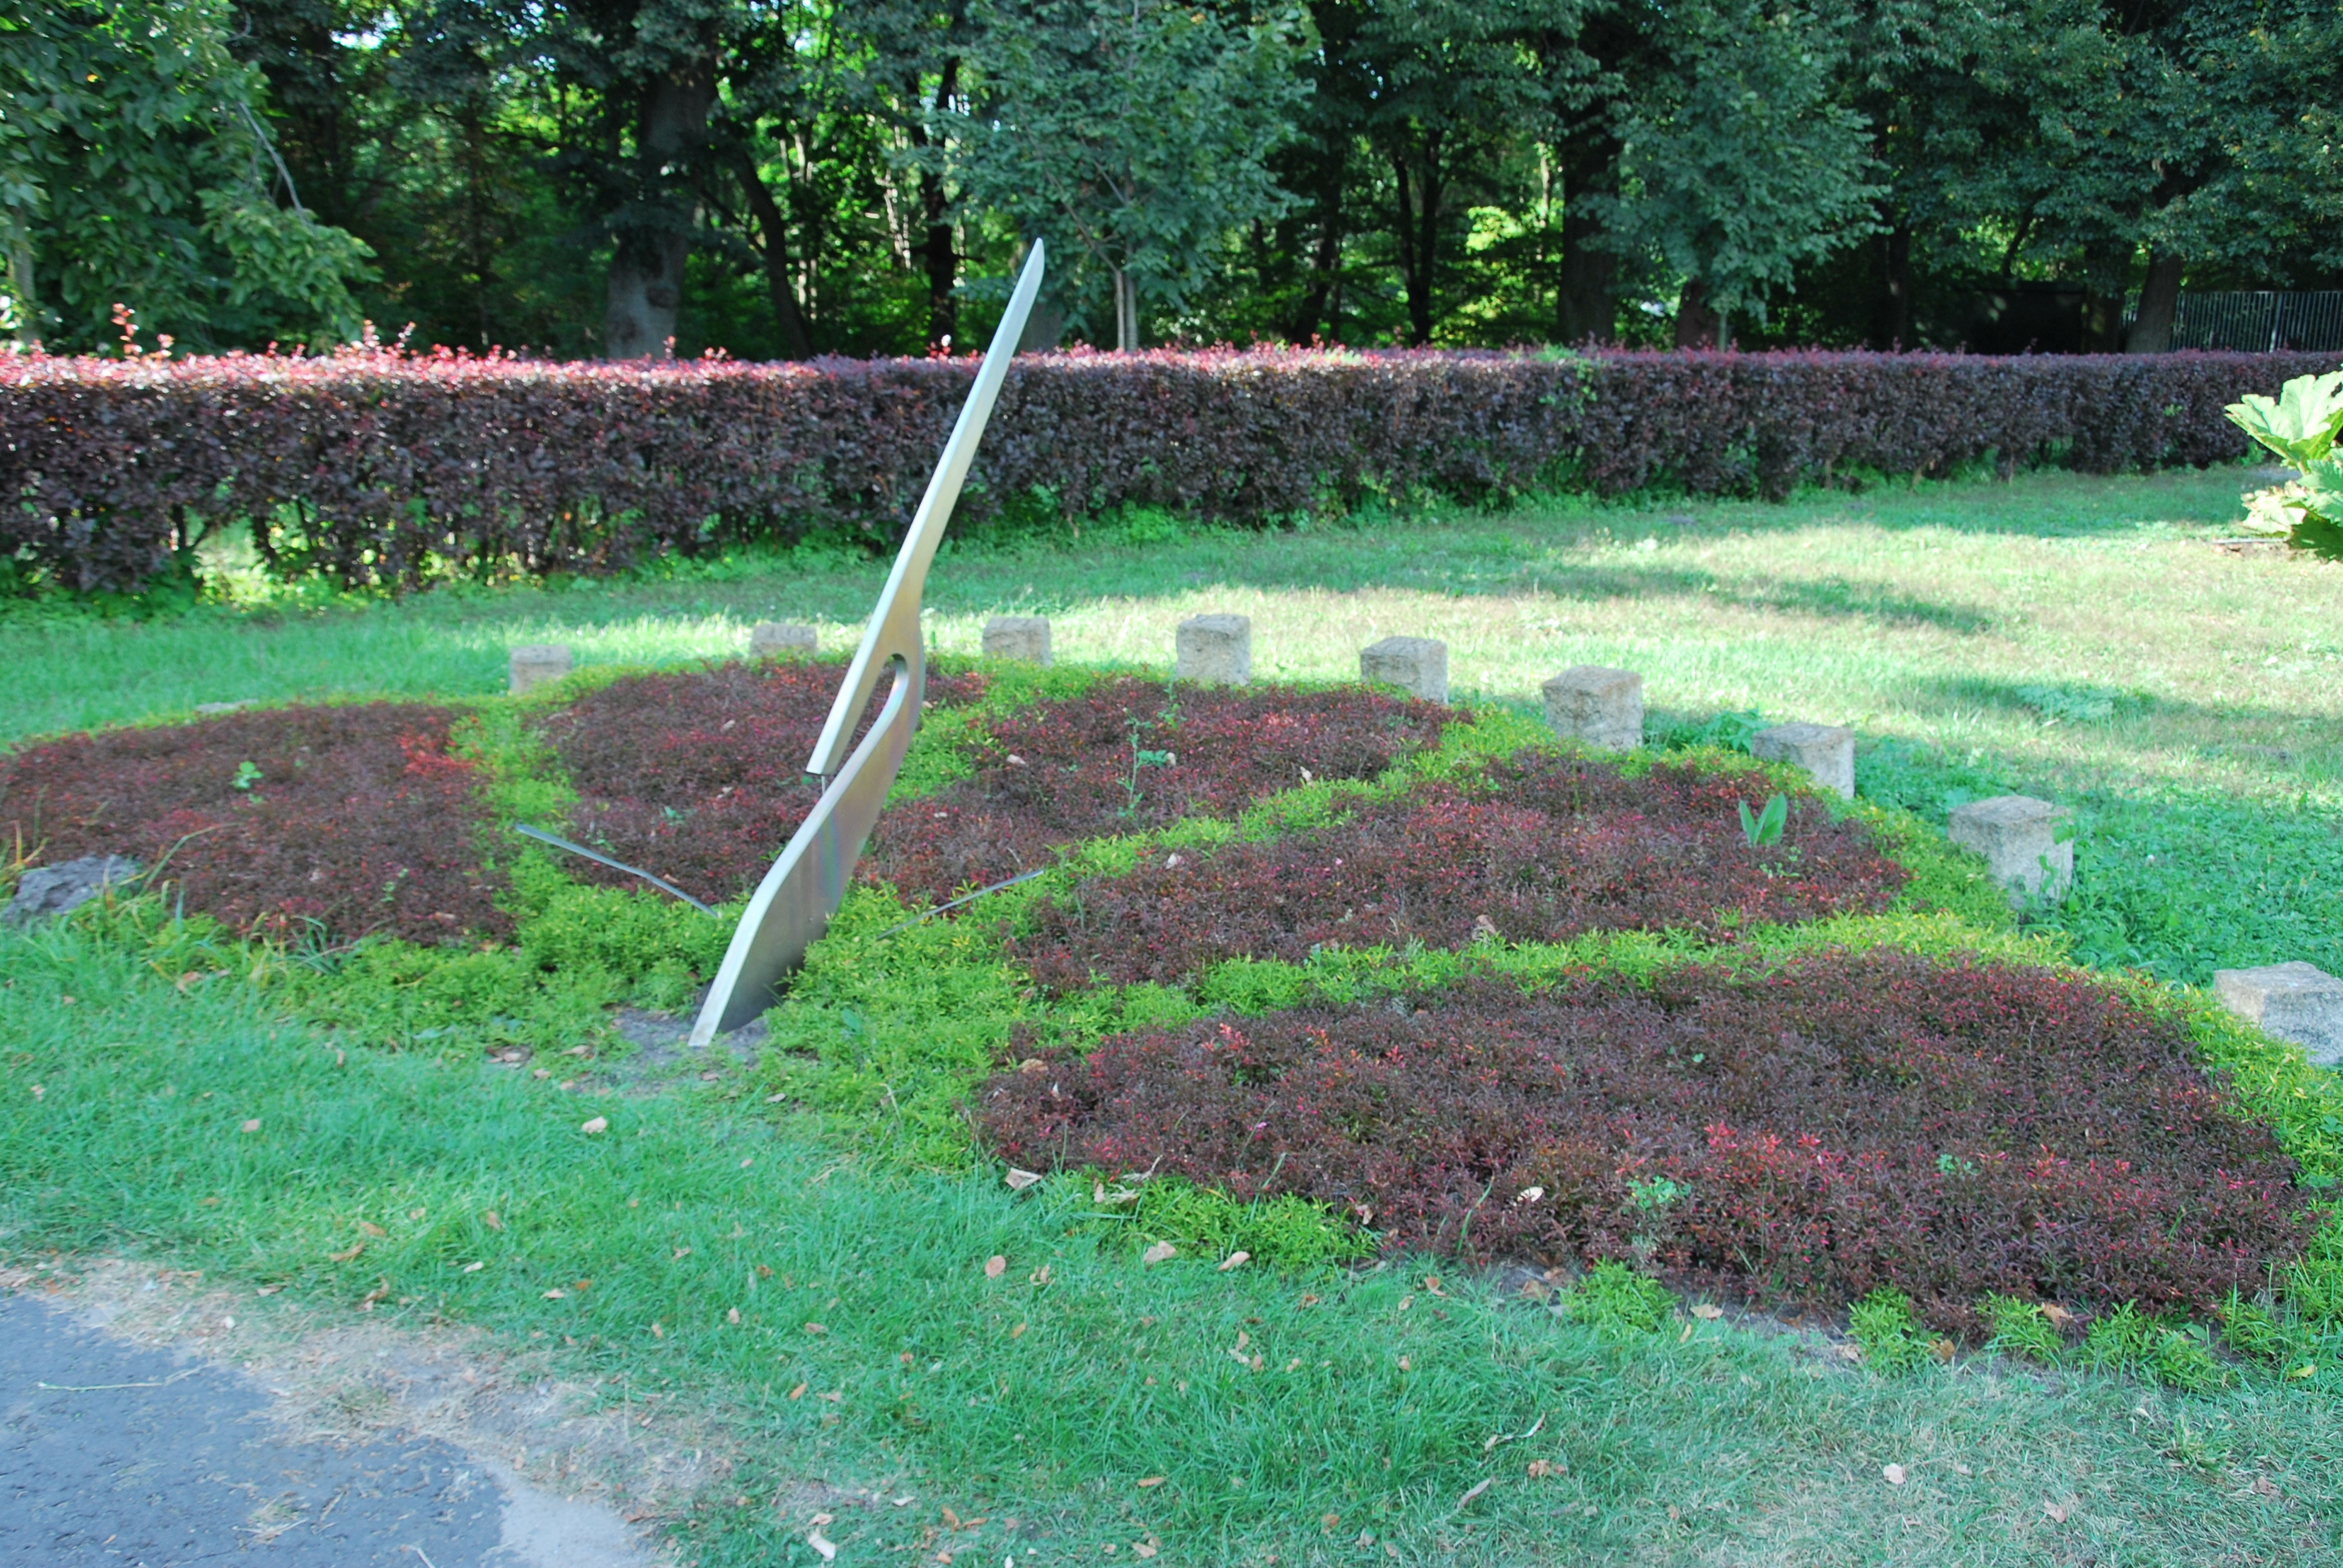 File:Floral Sundial, Botanical Garden Łódź